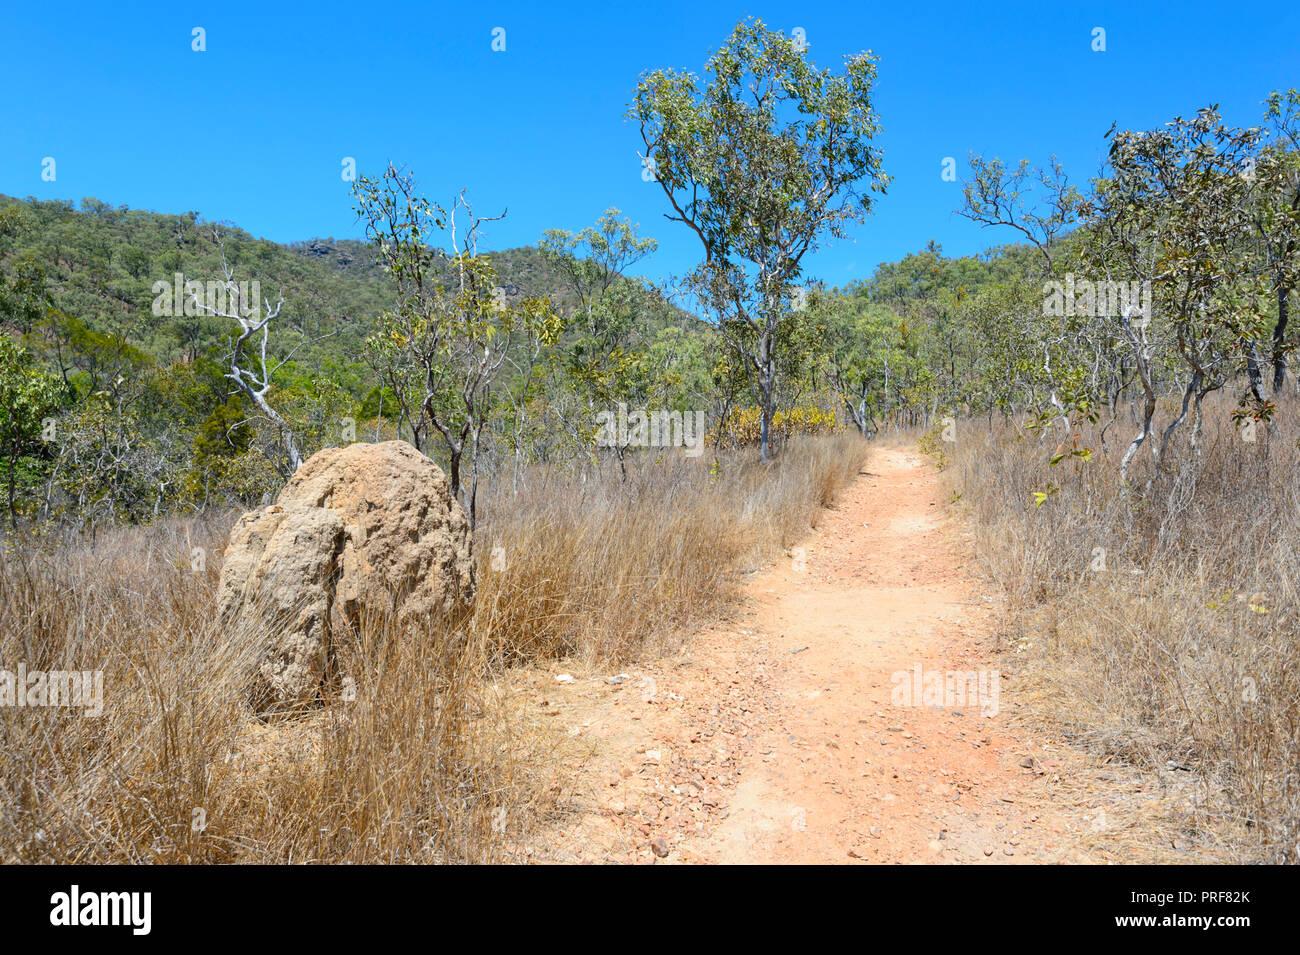 Walking trail with a termite mound in bushland, near Mareeba, Far North Queensland, FNQ, QLD, Australia - Stock Image